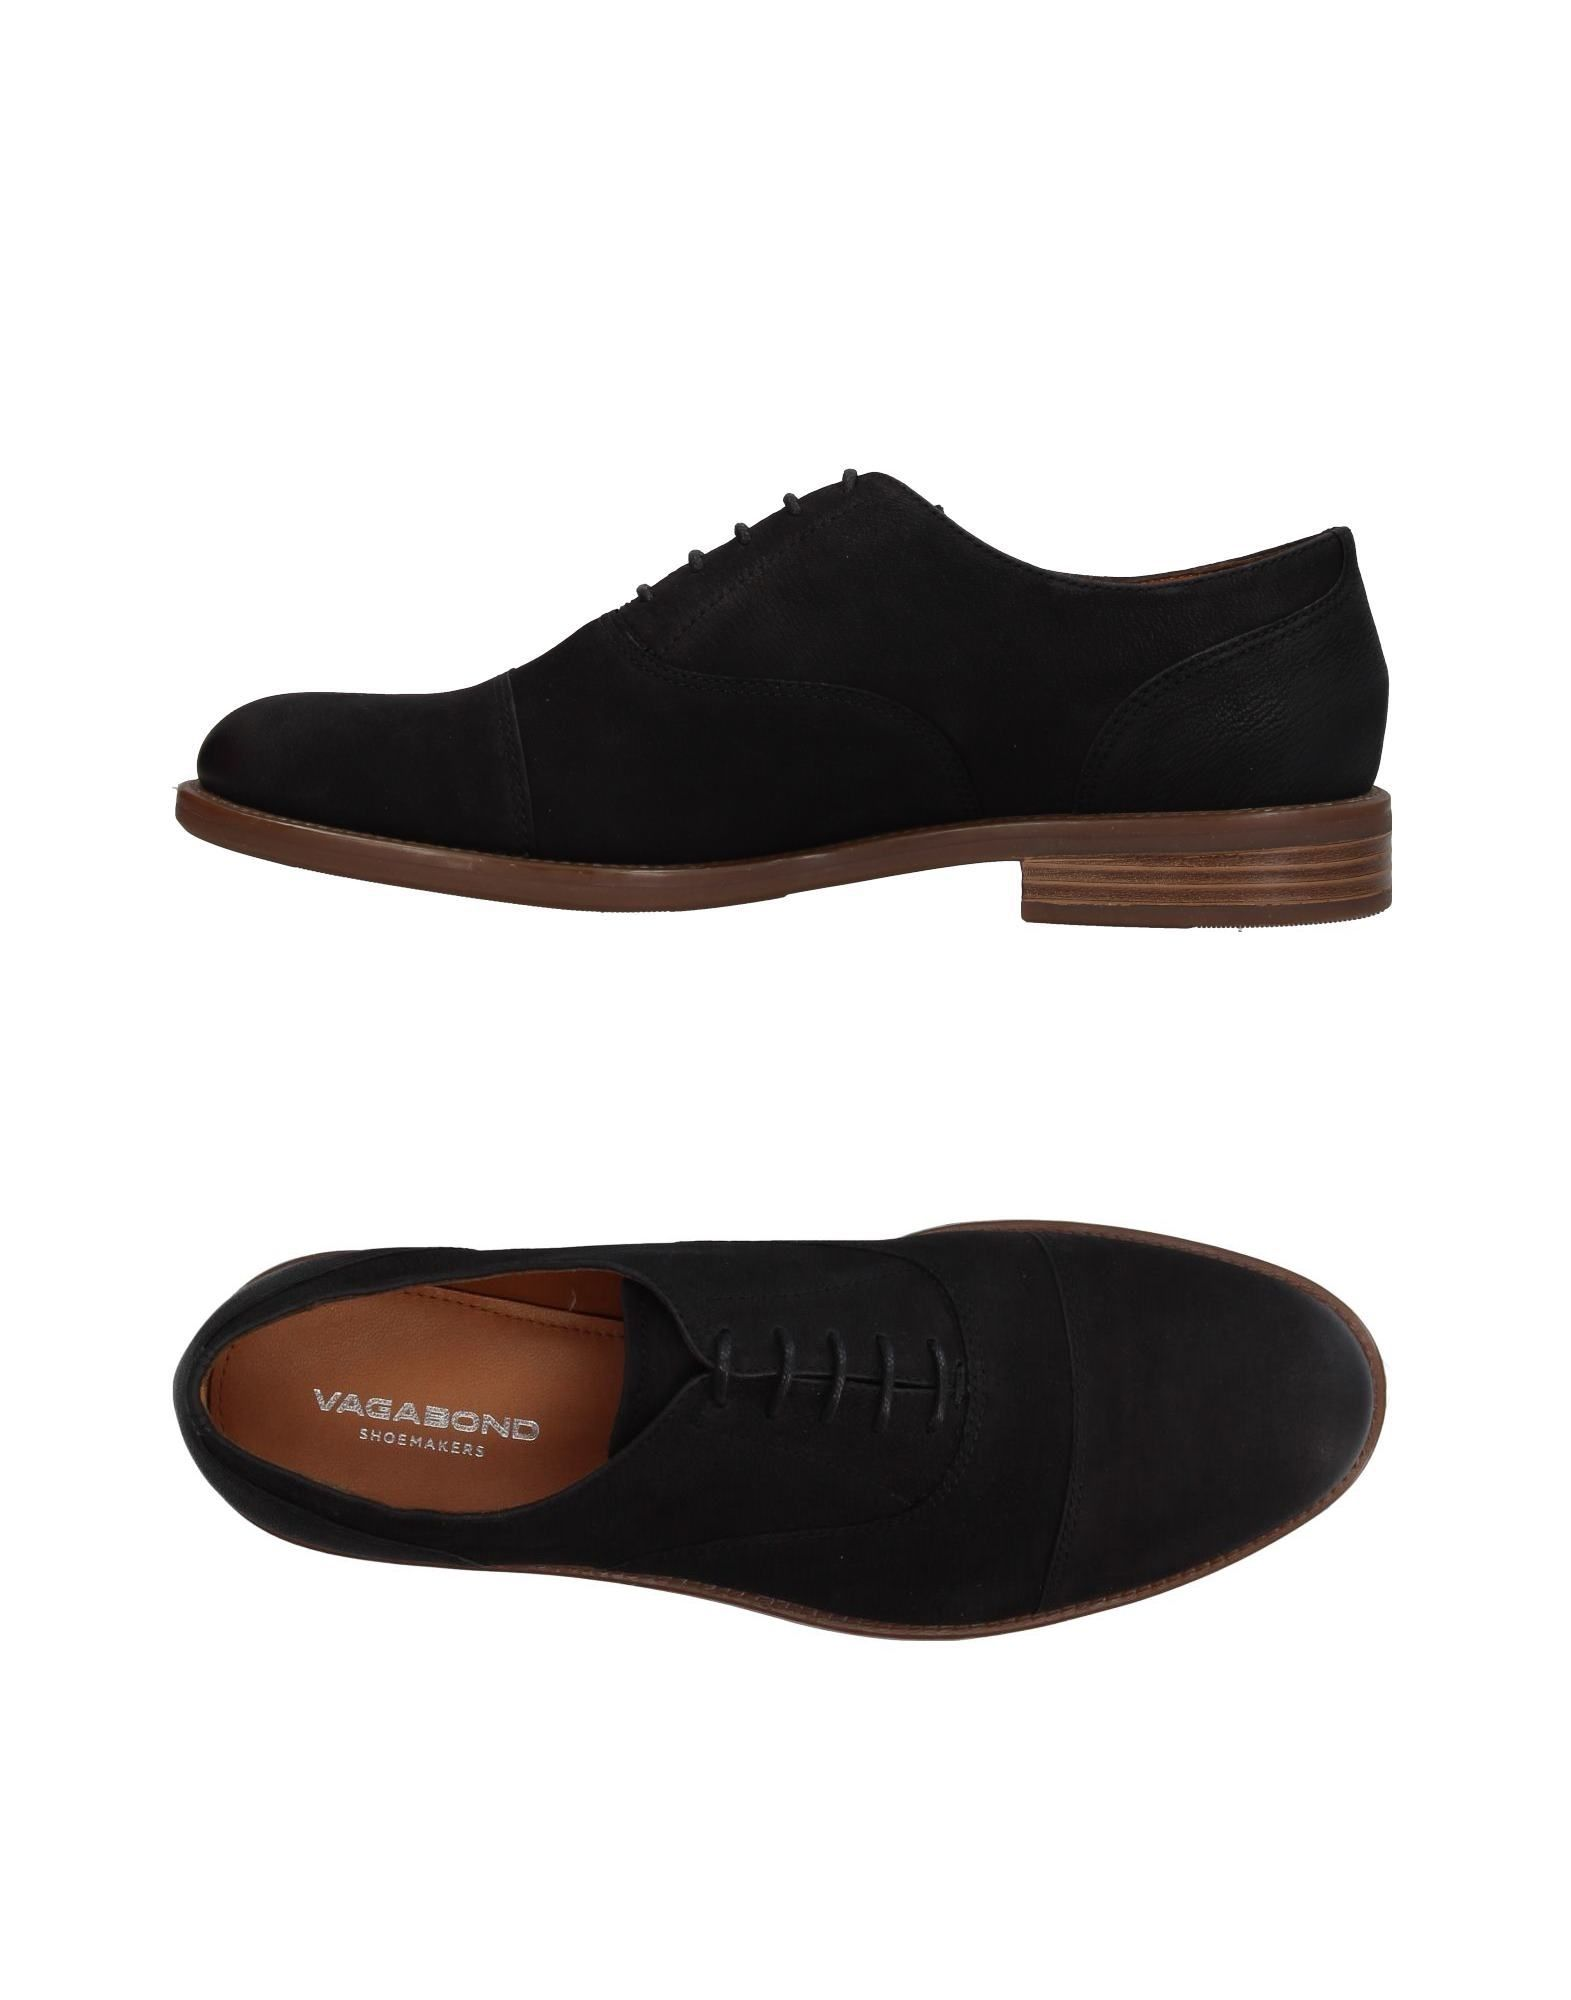 Stringate Vagabond Shoemakers Uomo - 11387795QU 11387795QU - 55d5ca